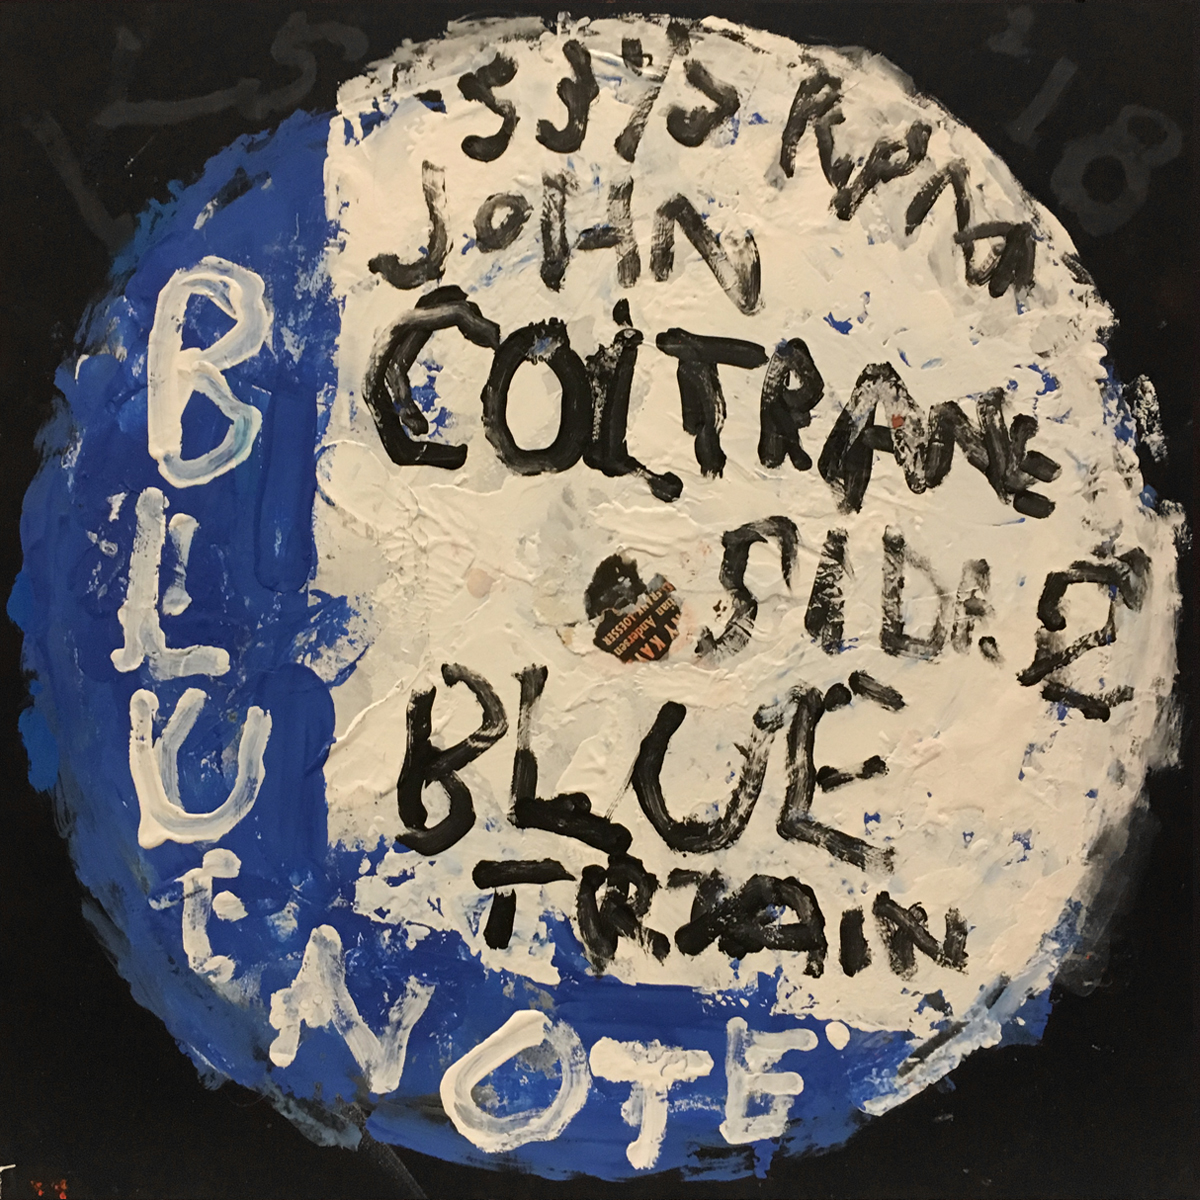 John Coltrane / Blue Train